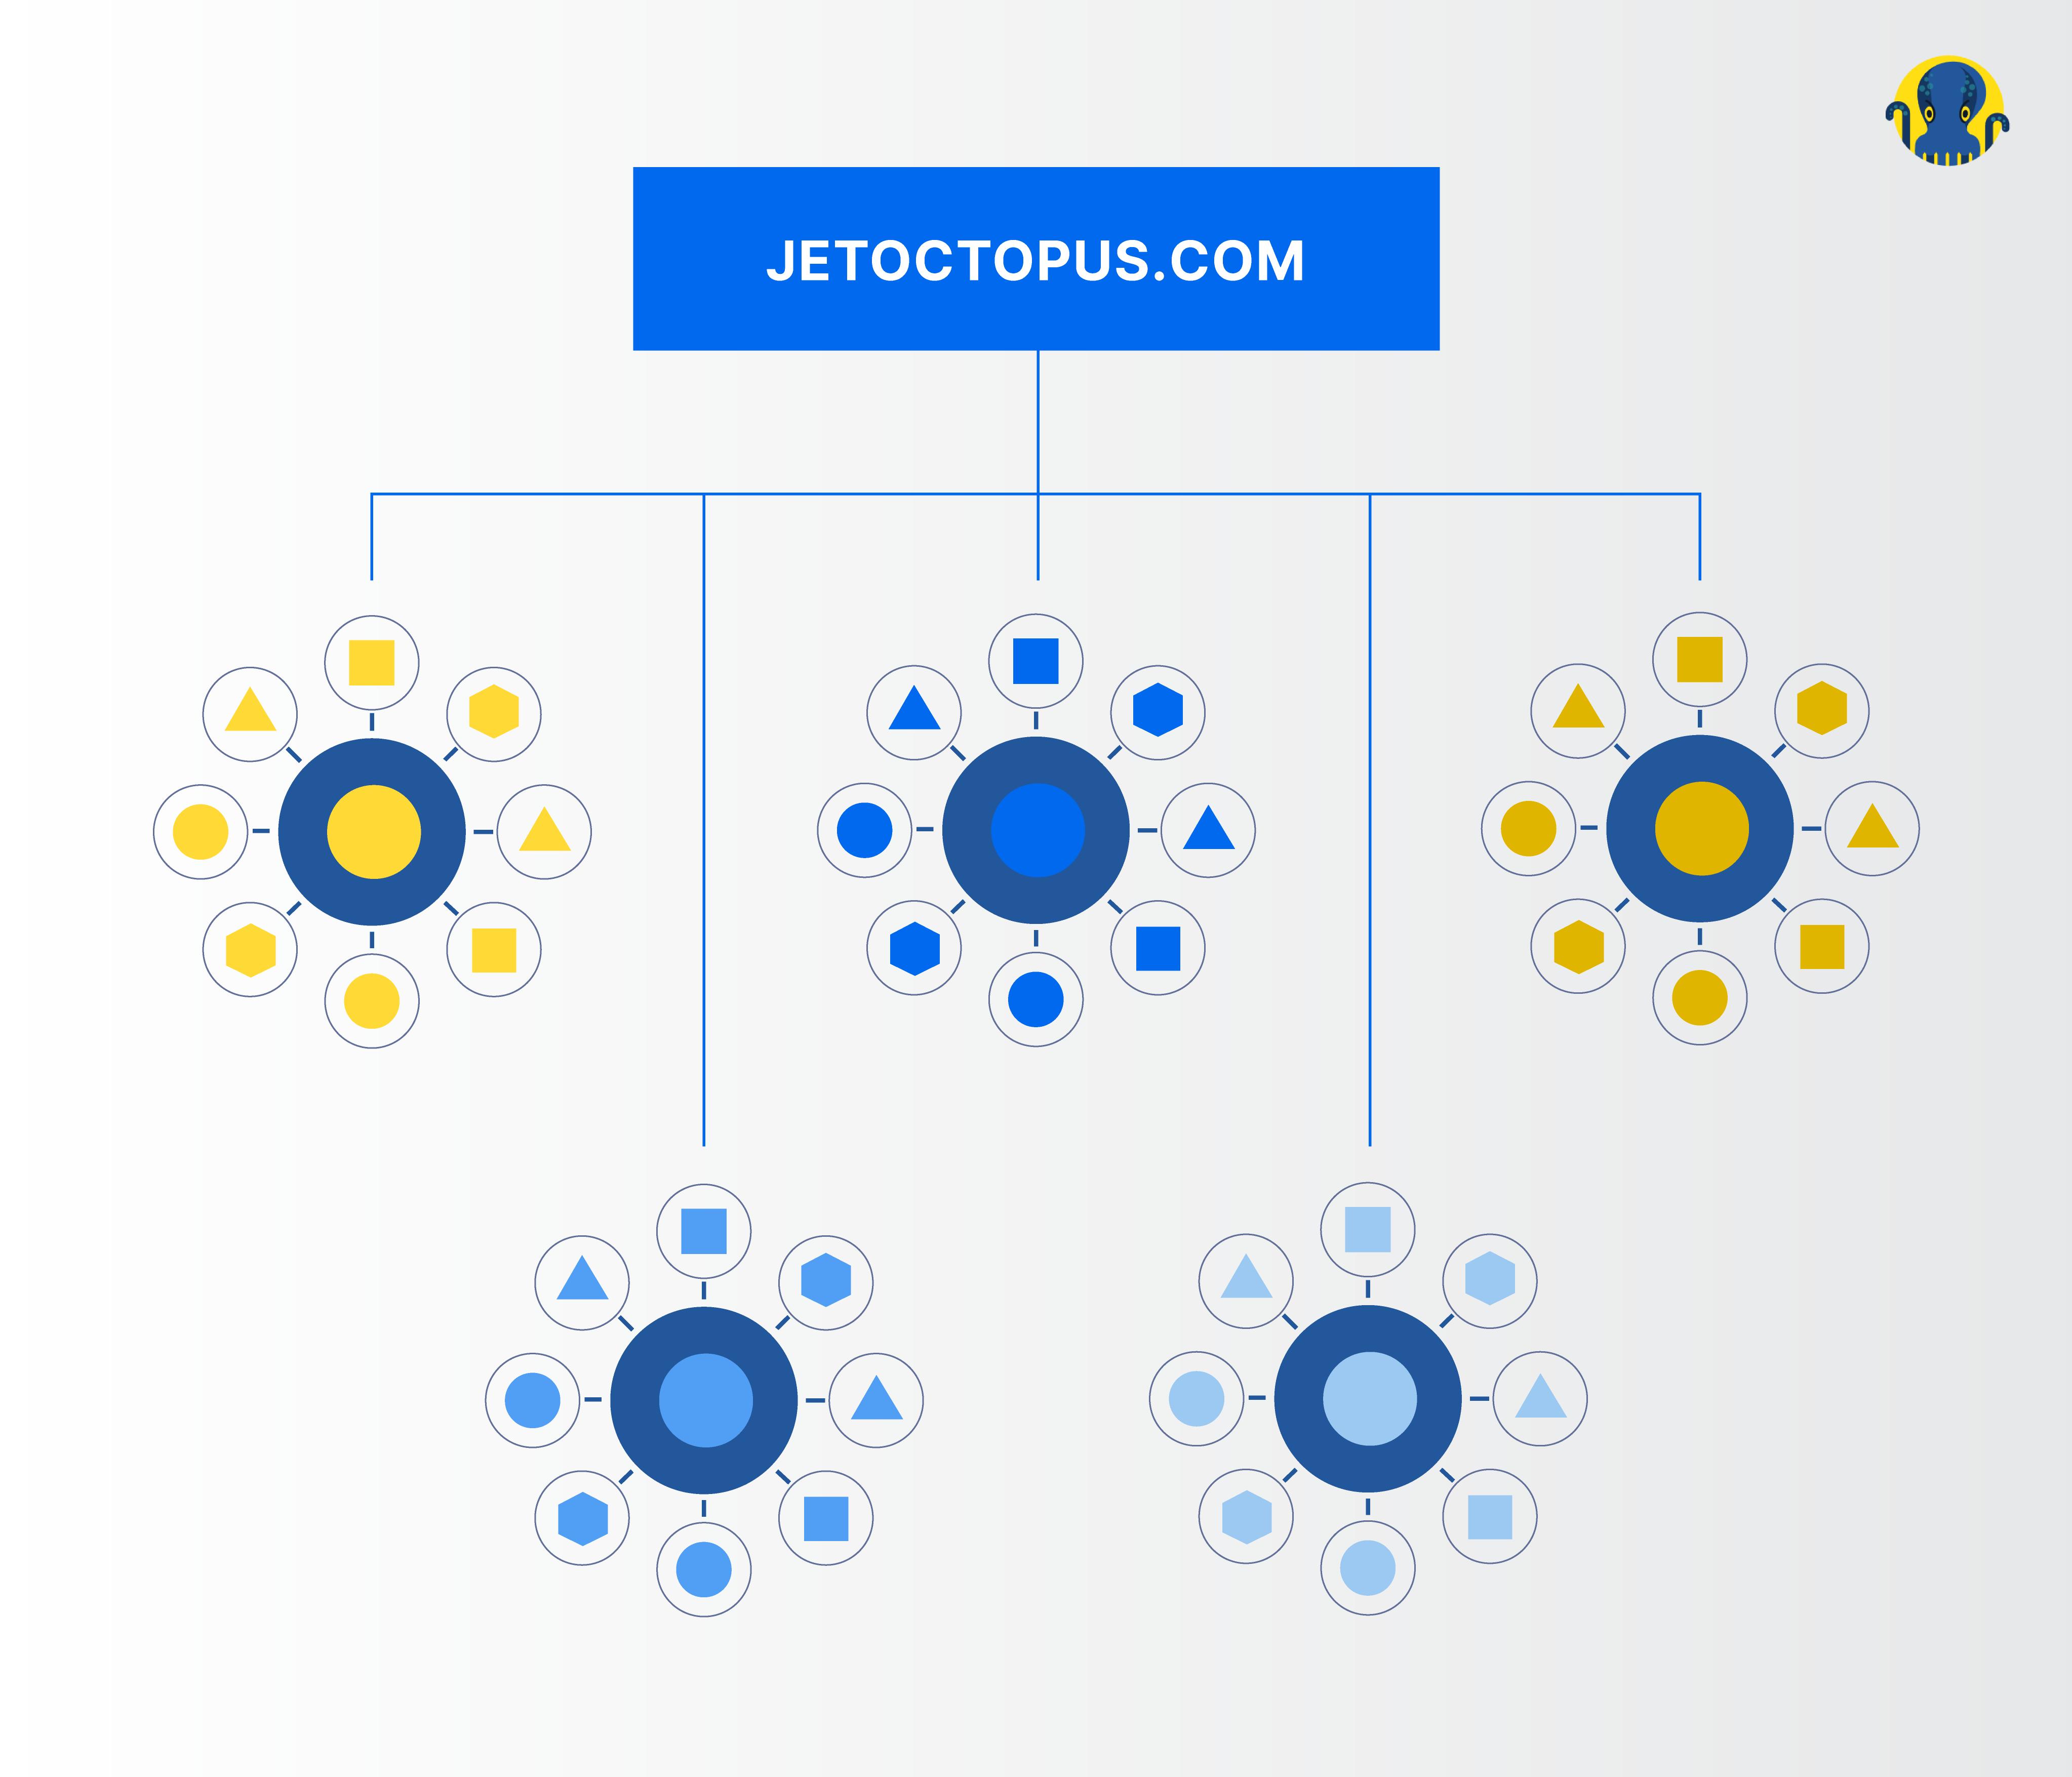 Jetoctopus Cluster